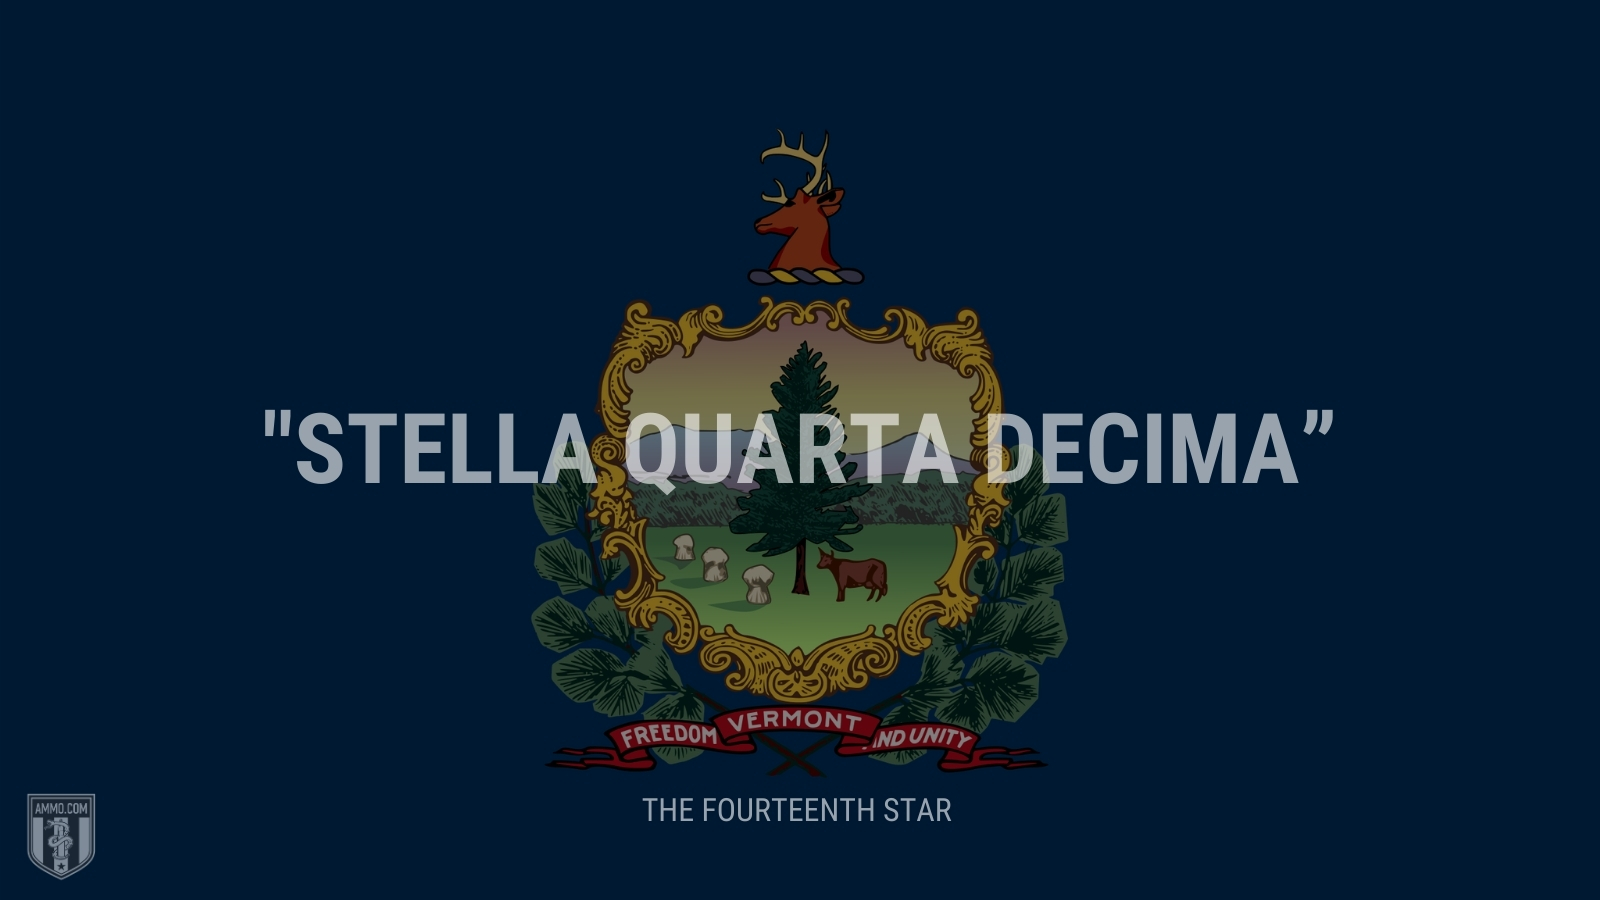 """Stella quarta decima"" - The fourteenth star"